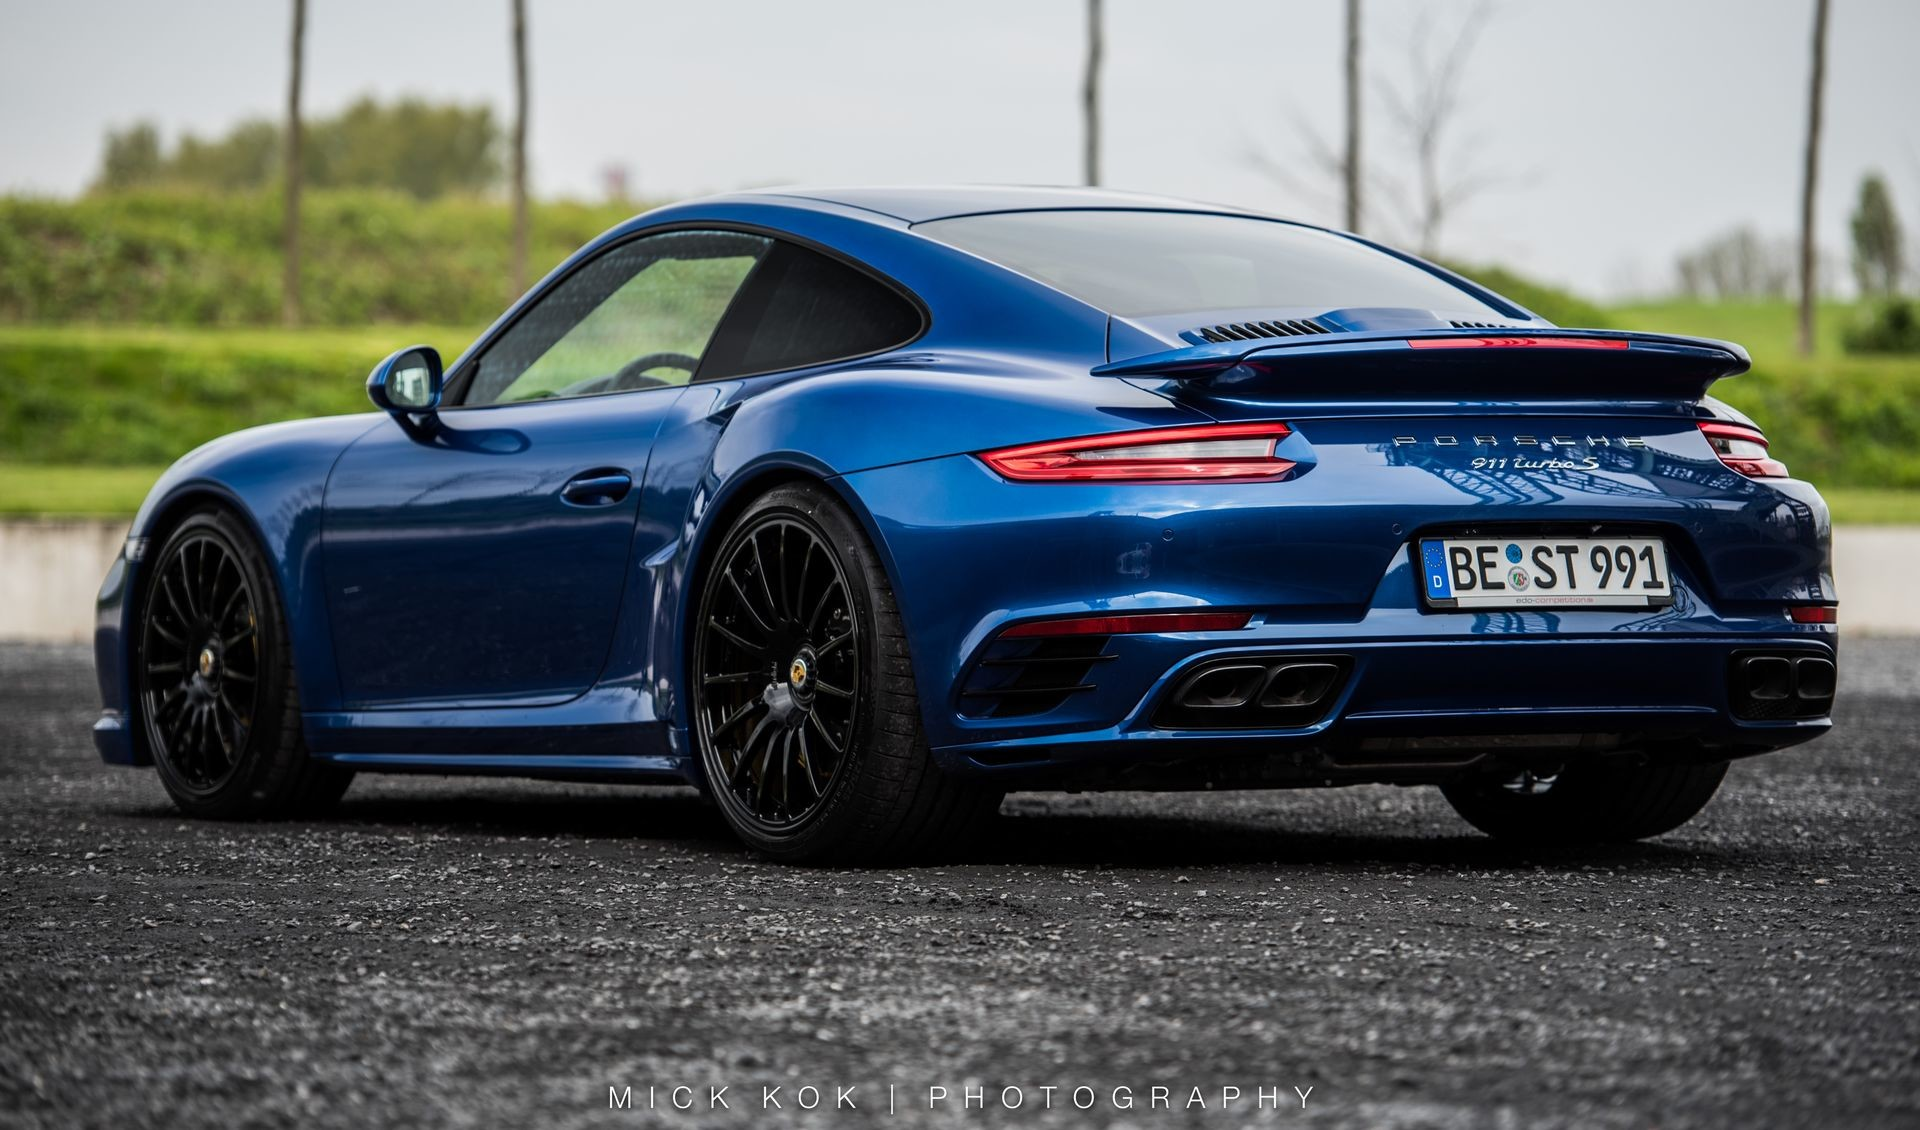 Foto de Porsche 911 Turbo S Blue Arrow (3/25)